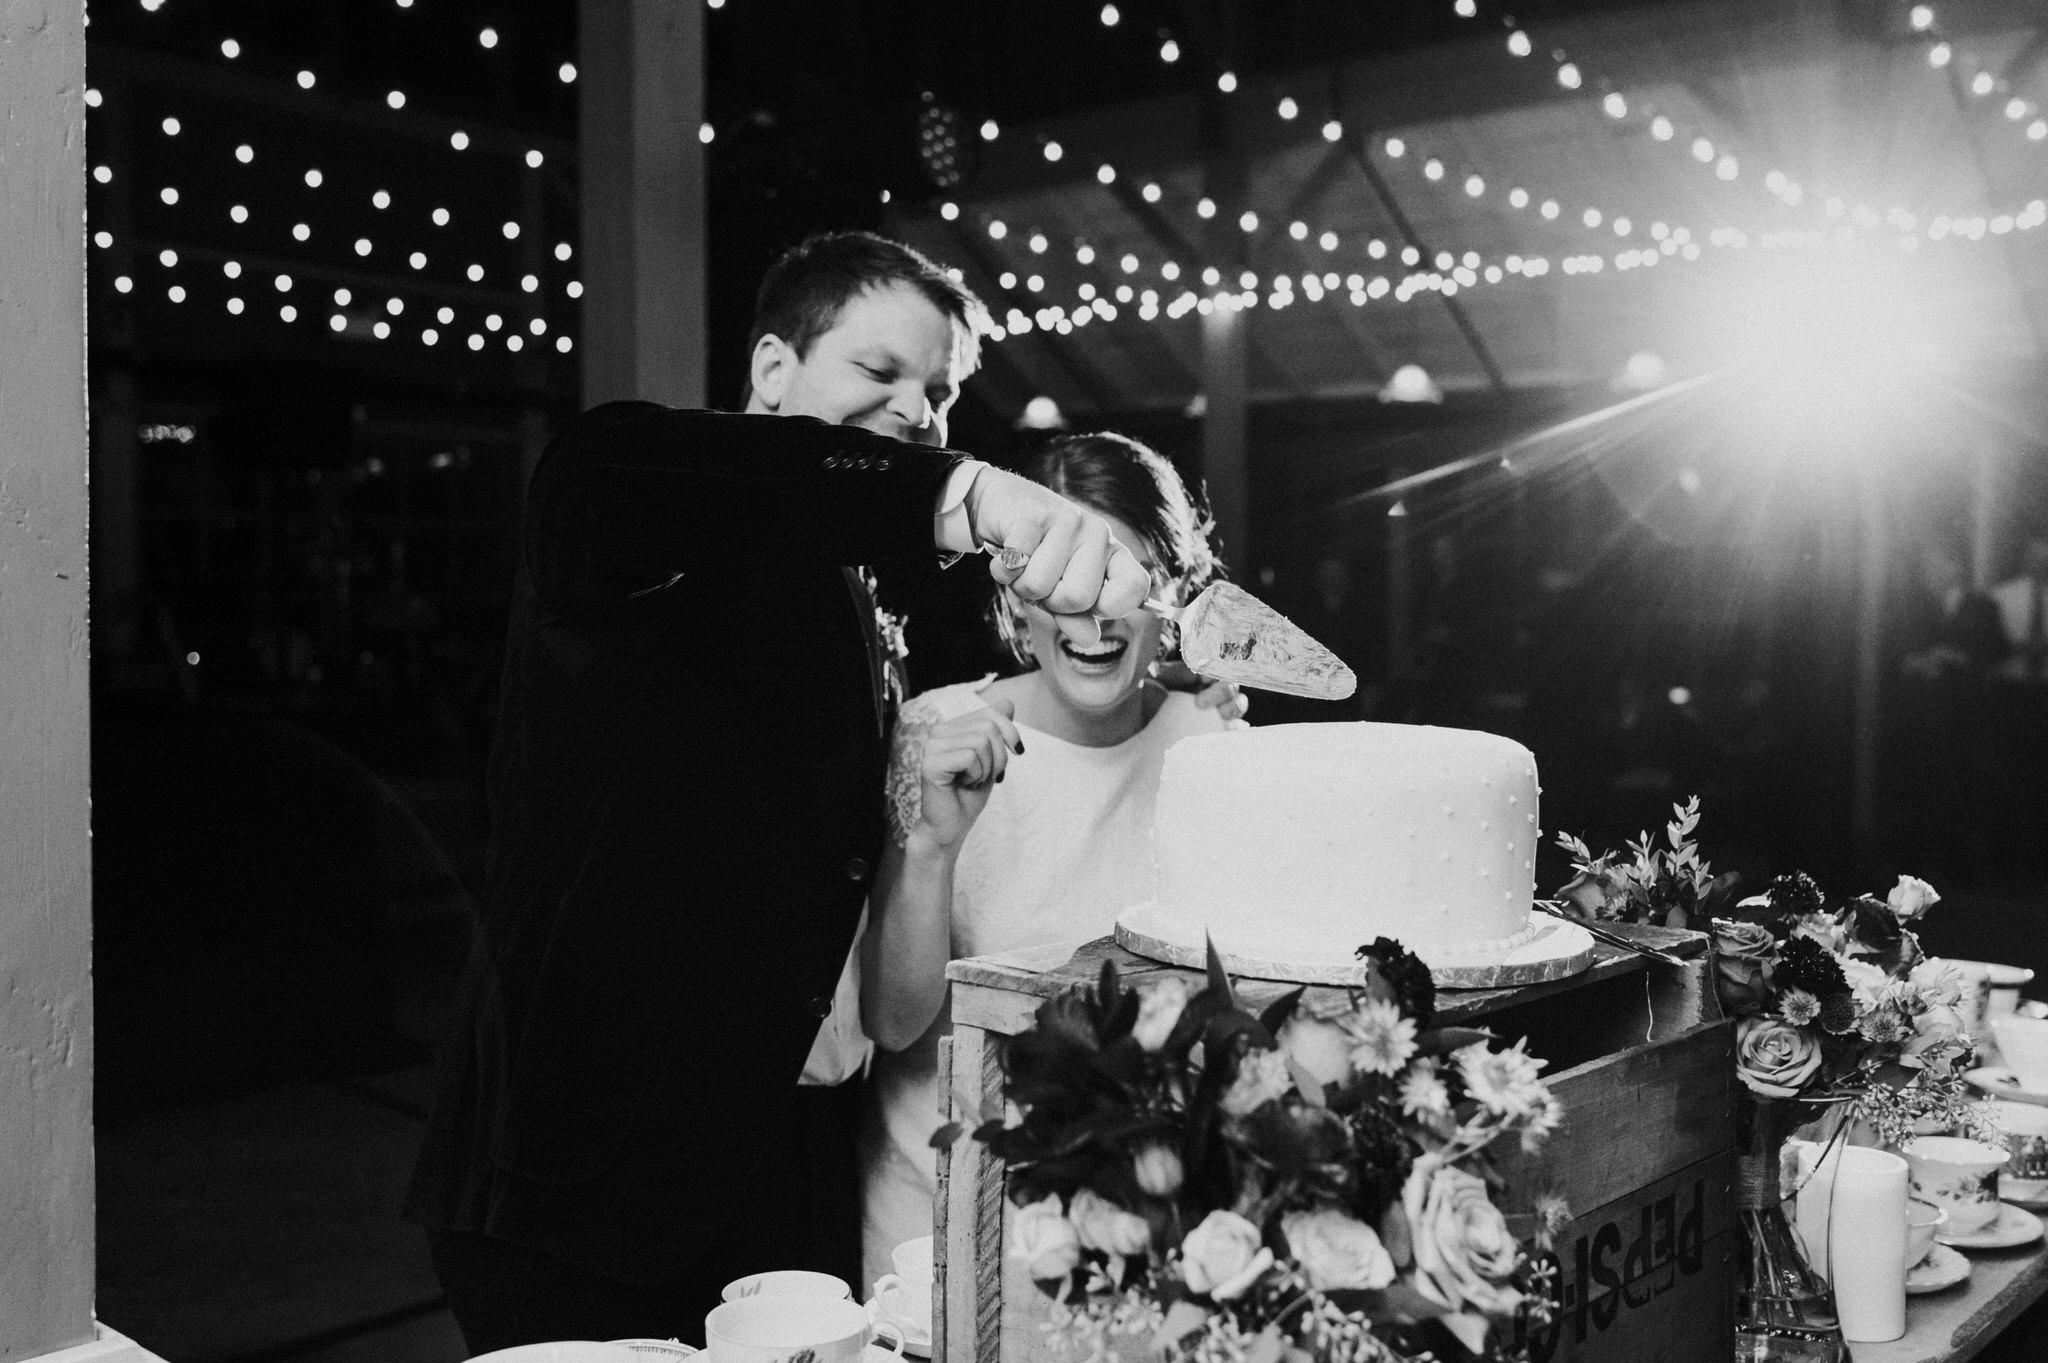 scarletoneillphotography_weddingphotography_prince edward county weddings165.JPG